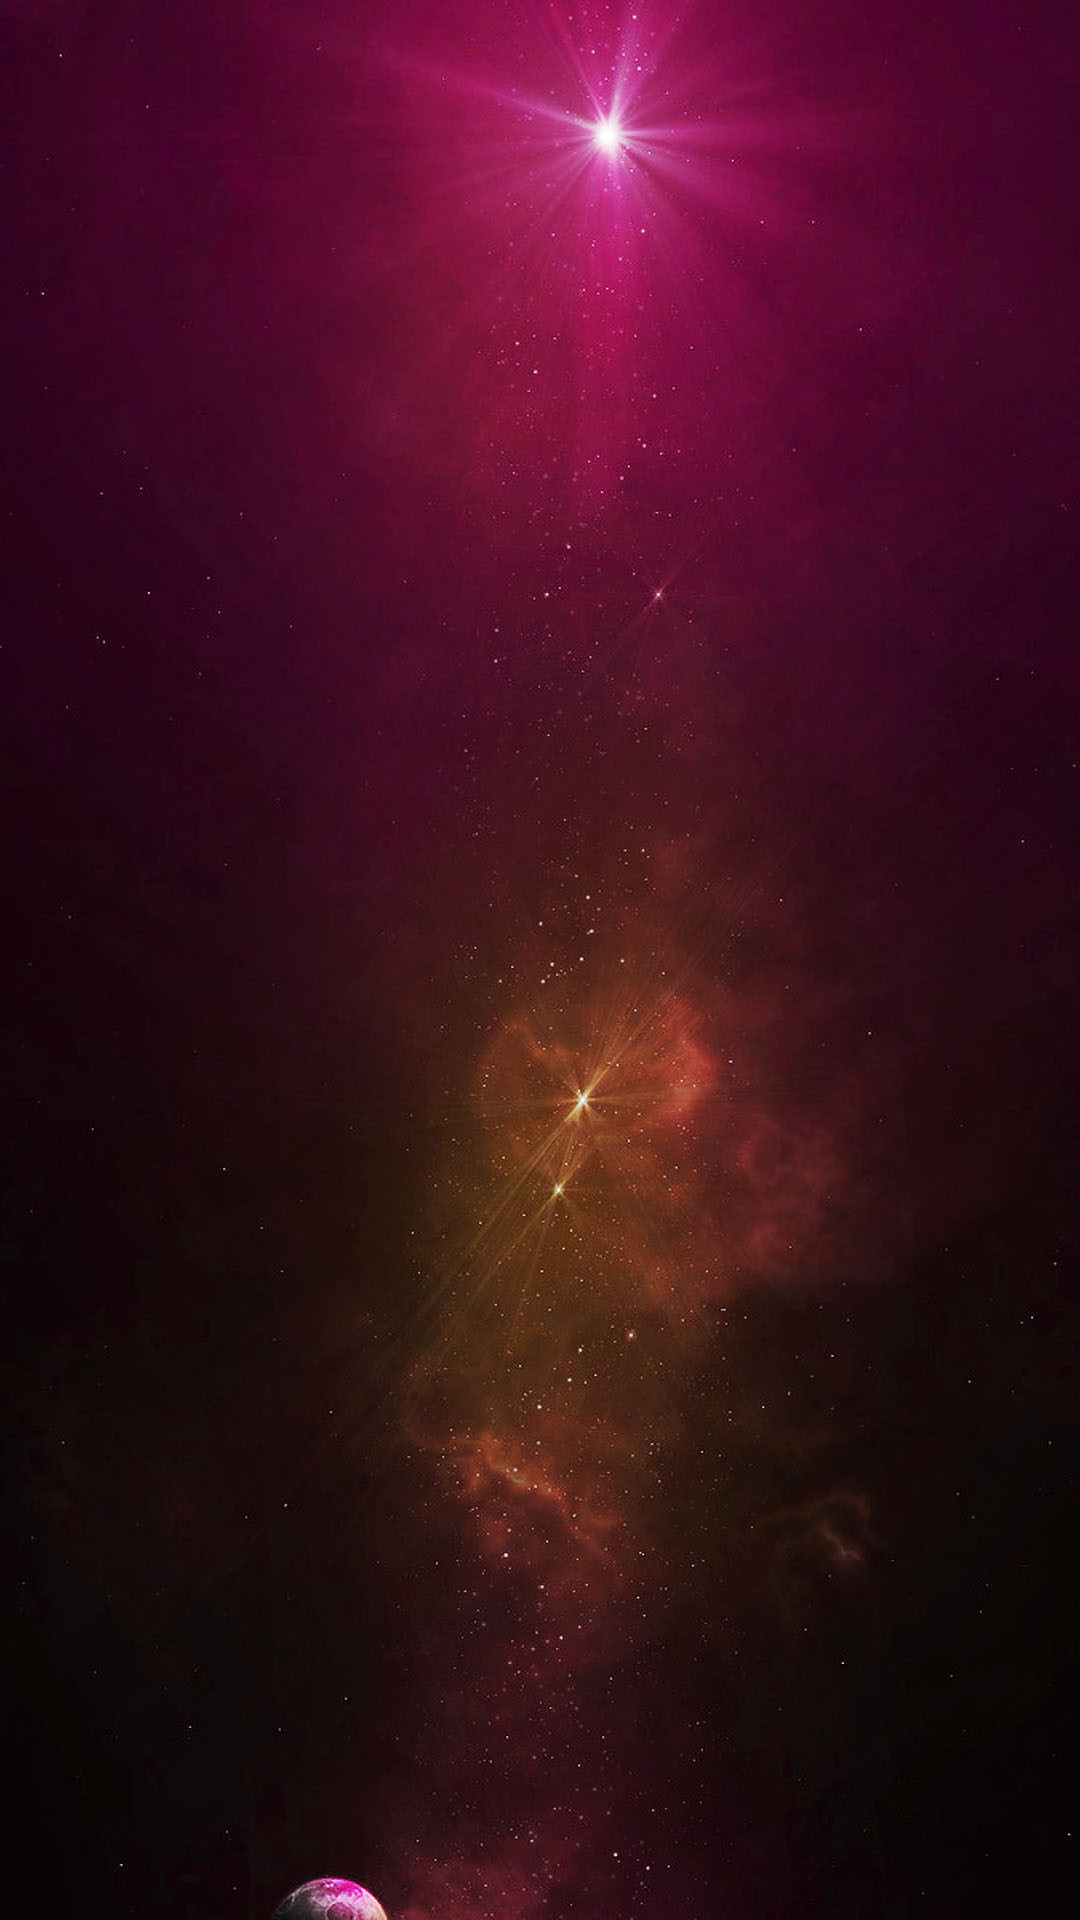 Orange Galaxy Dust Purple Star Android Wallpaper …